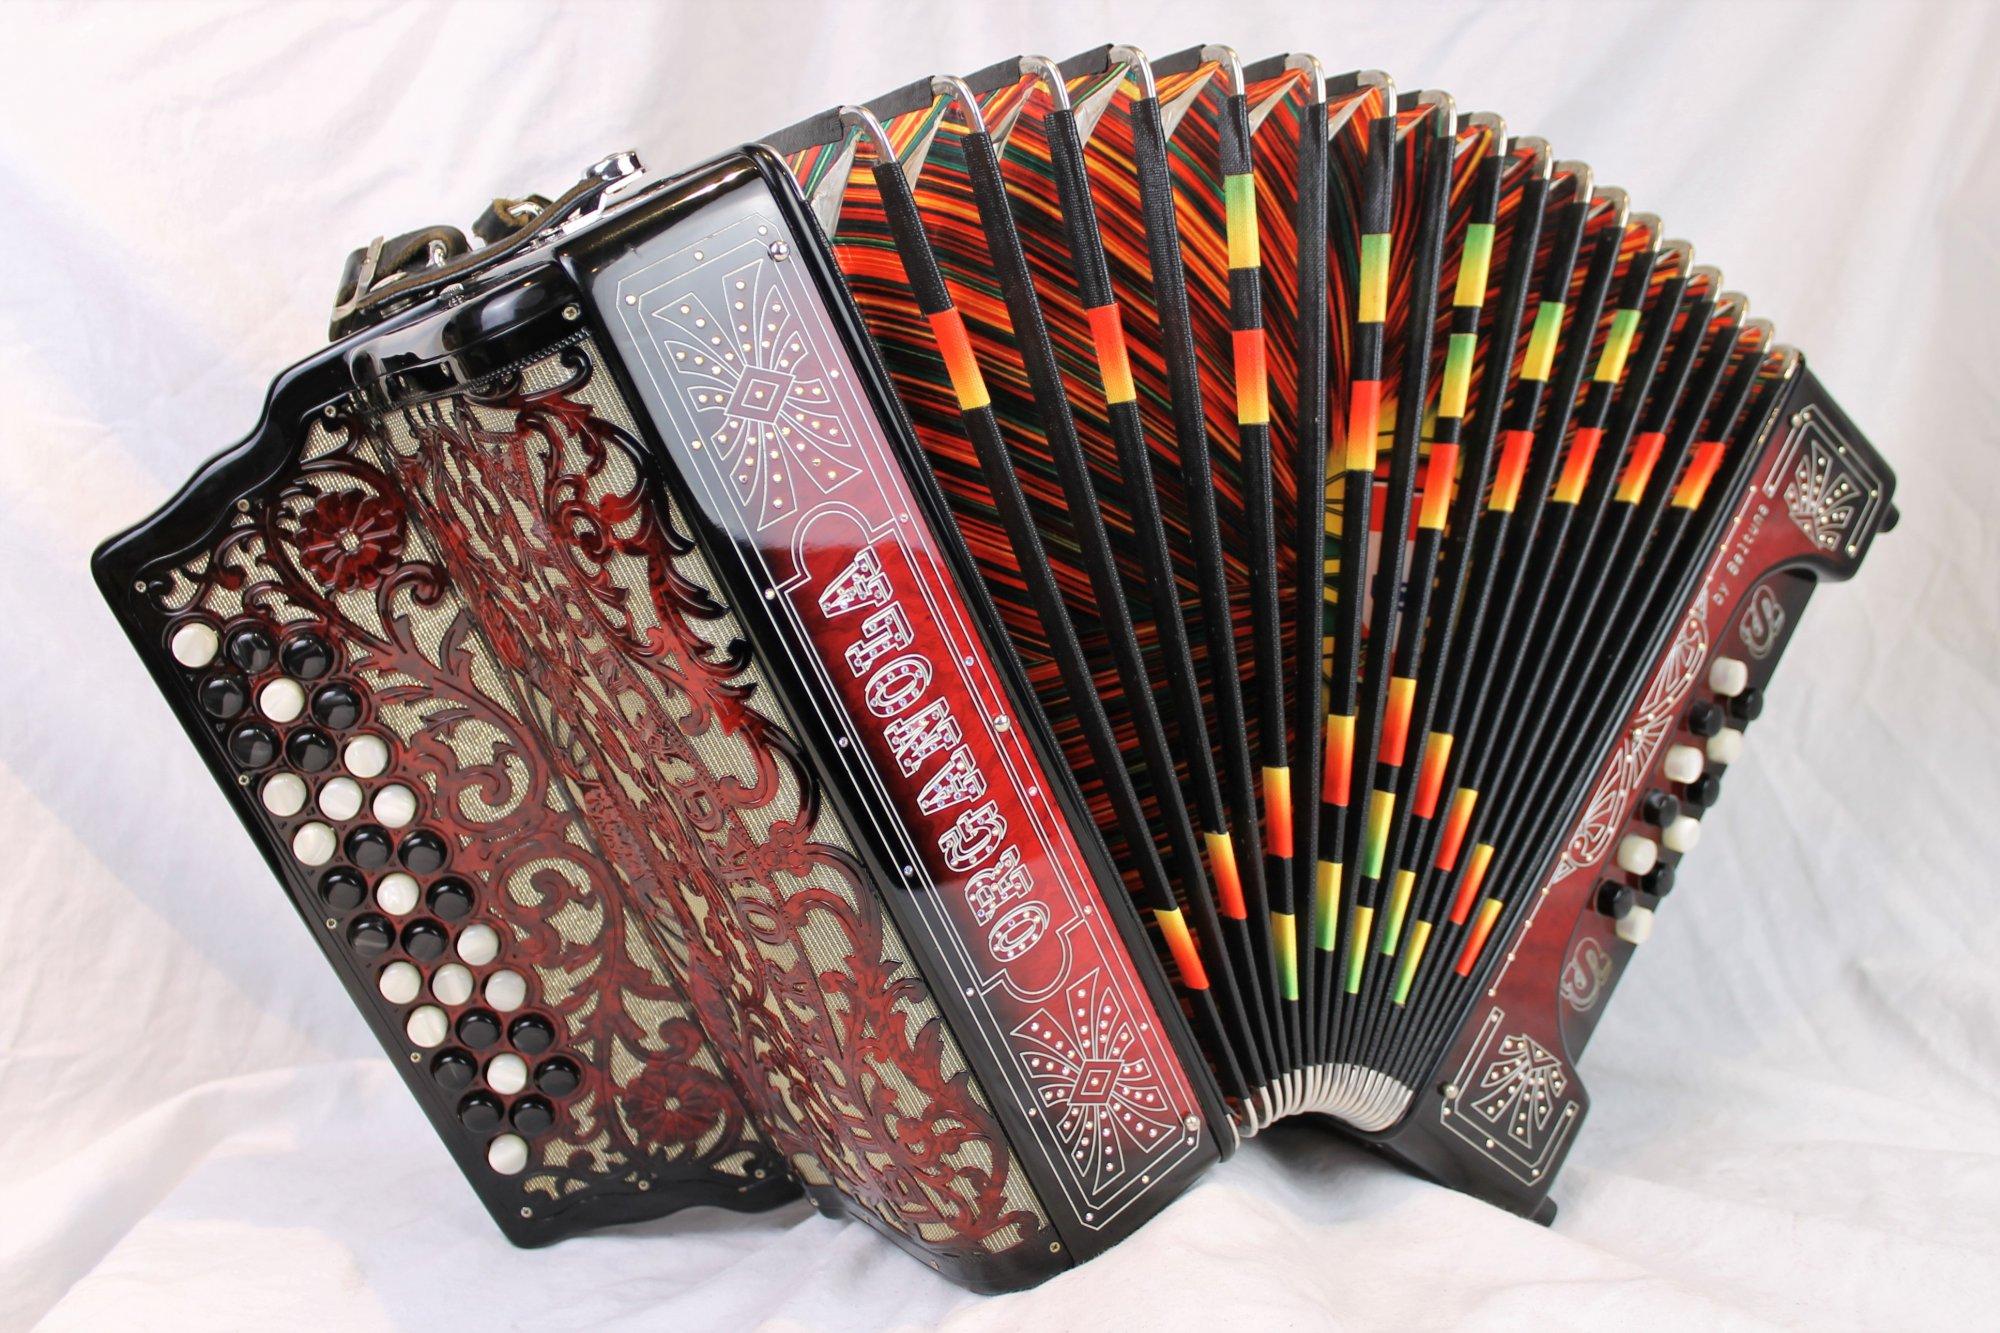 4598 - Rosewood Beltuna Super Organola Portuguese Concertina Diatonic Button Accordion FBbEb MMMM 33 12